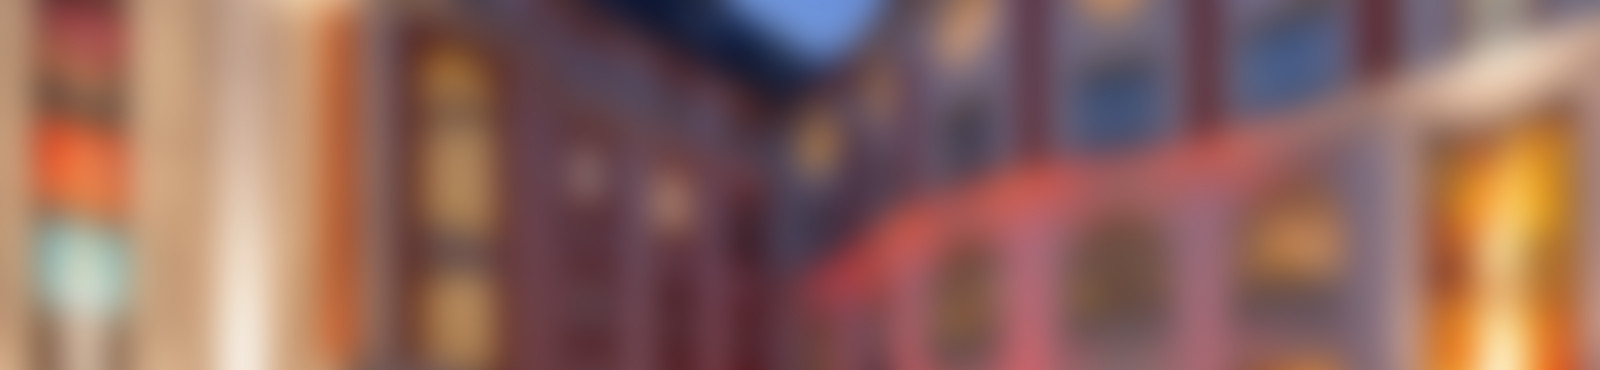 Blurred ef7c2c4b02